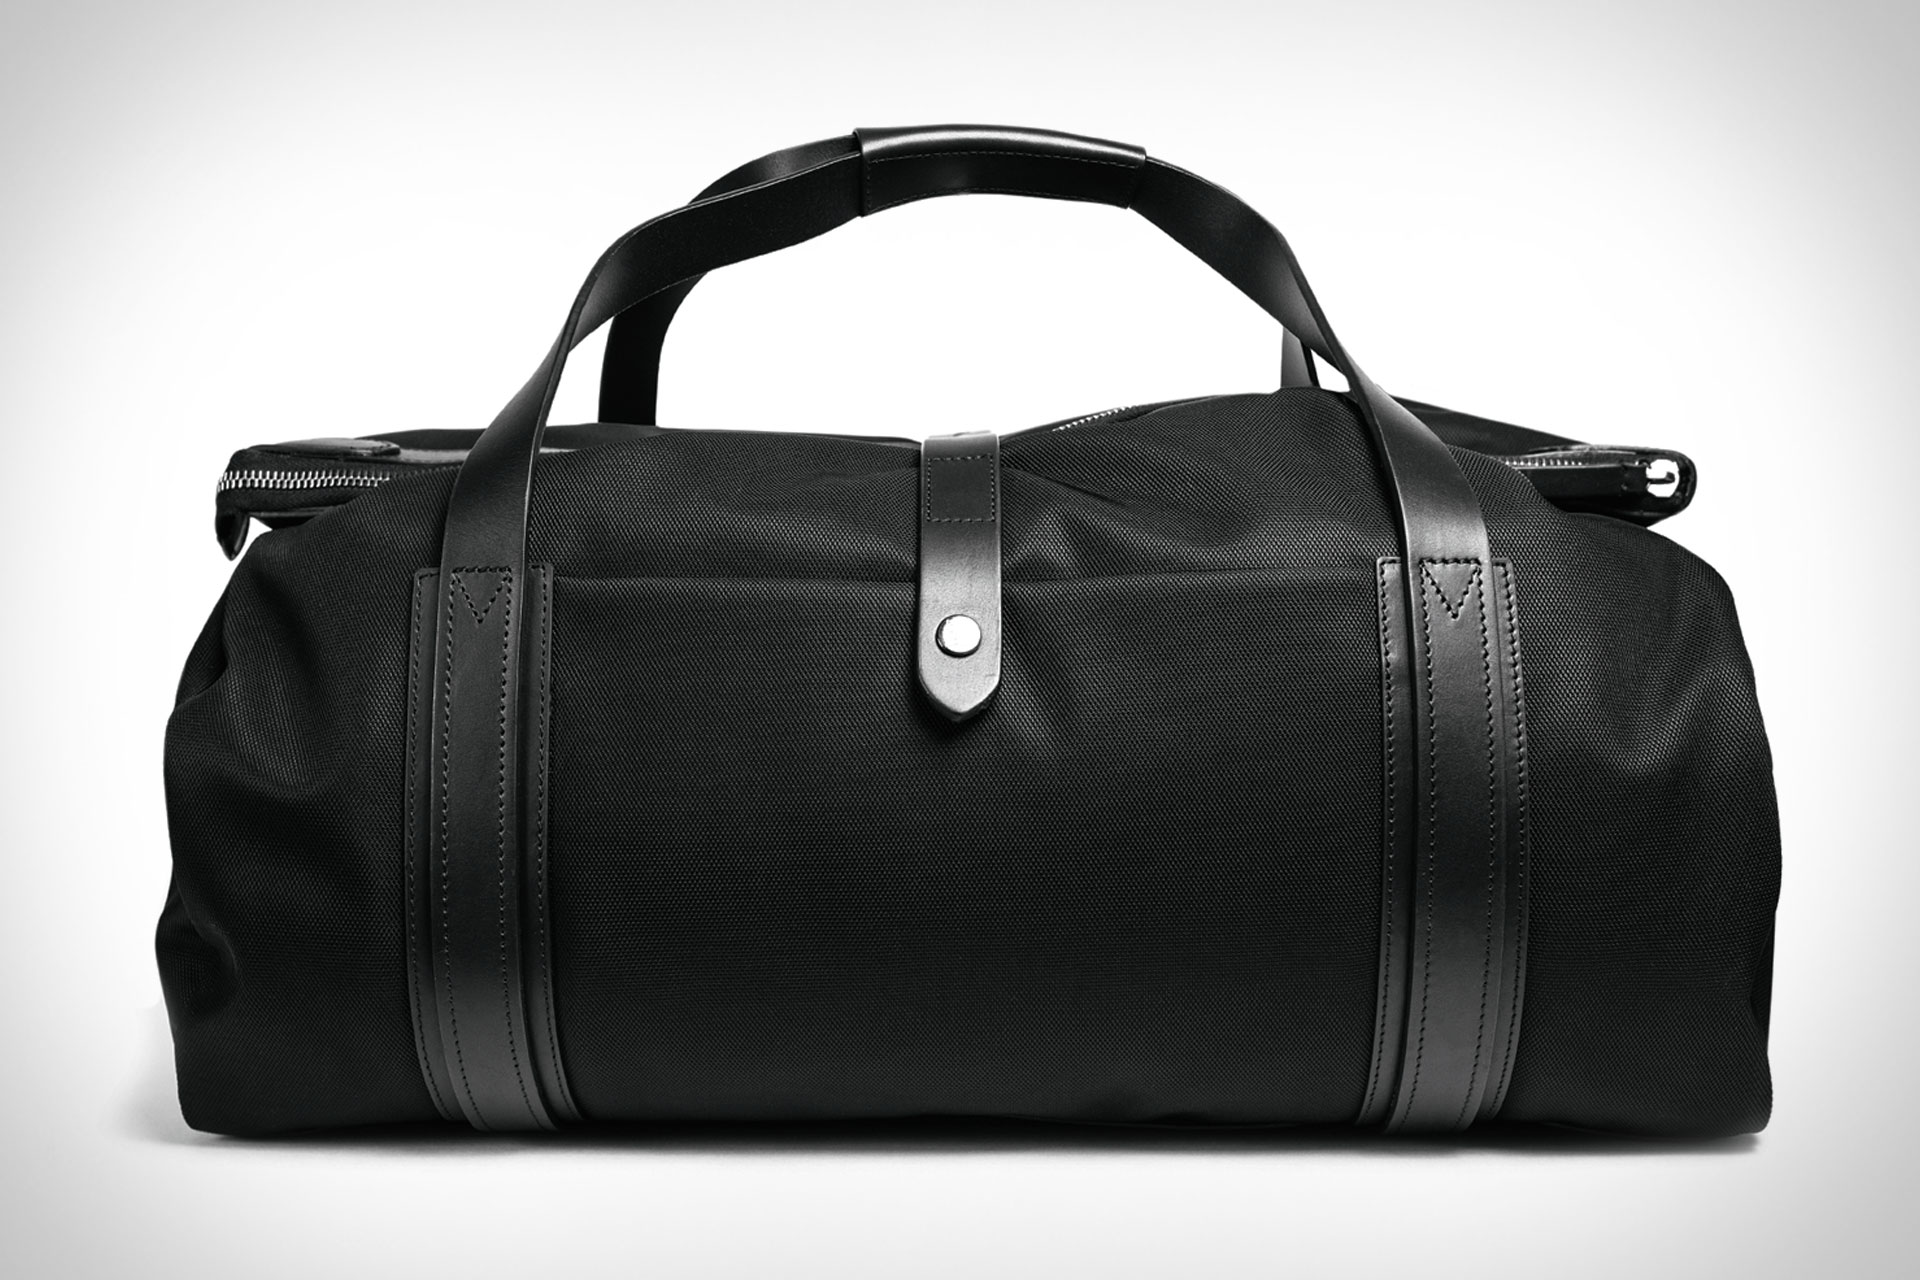 Mismo M/S Explorer Duffel Bag